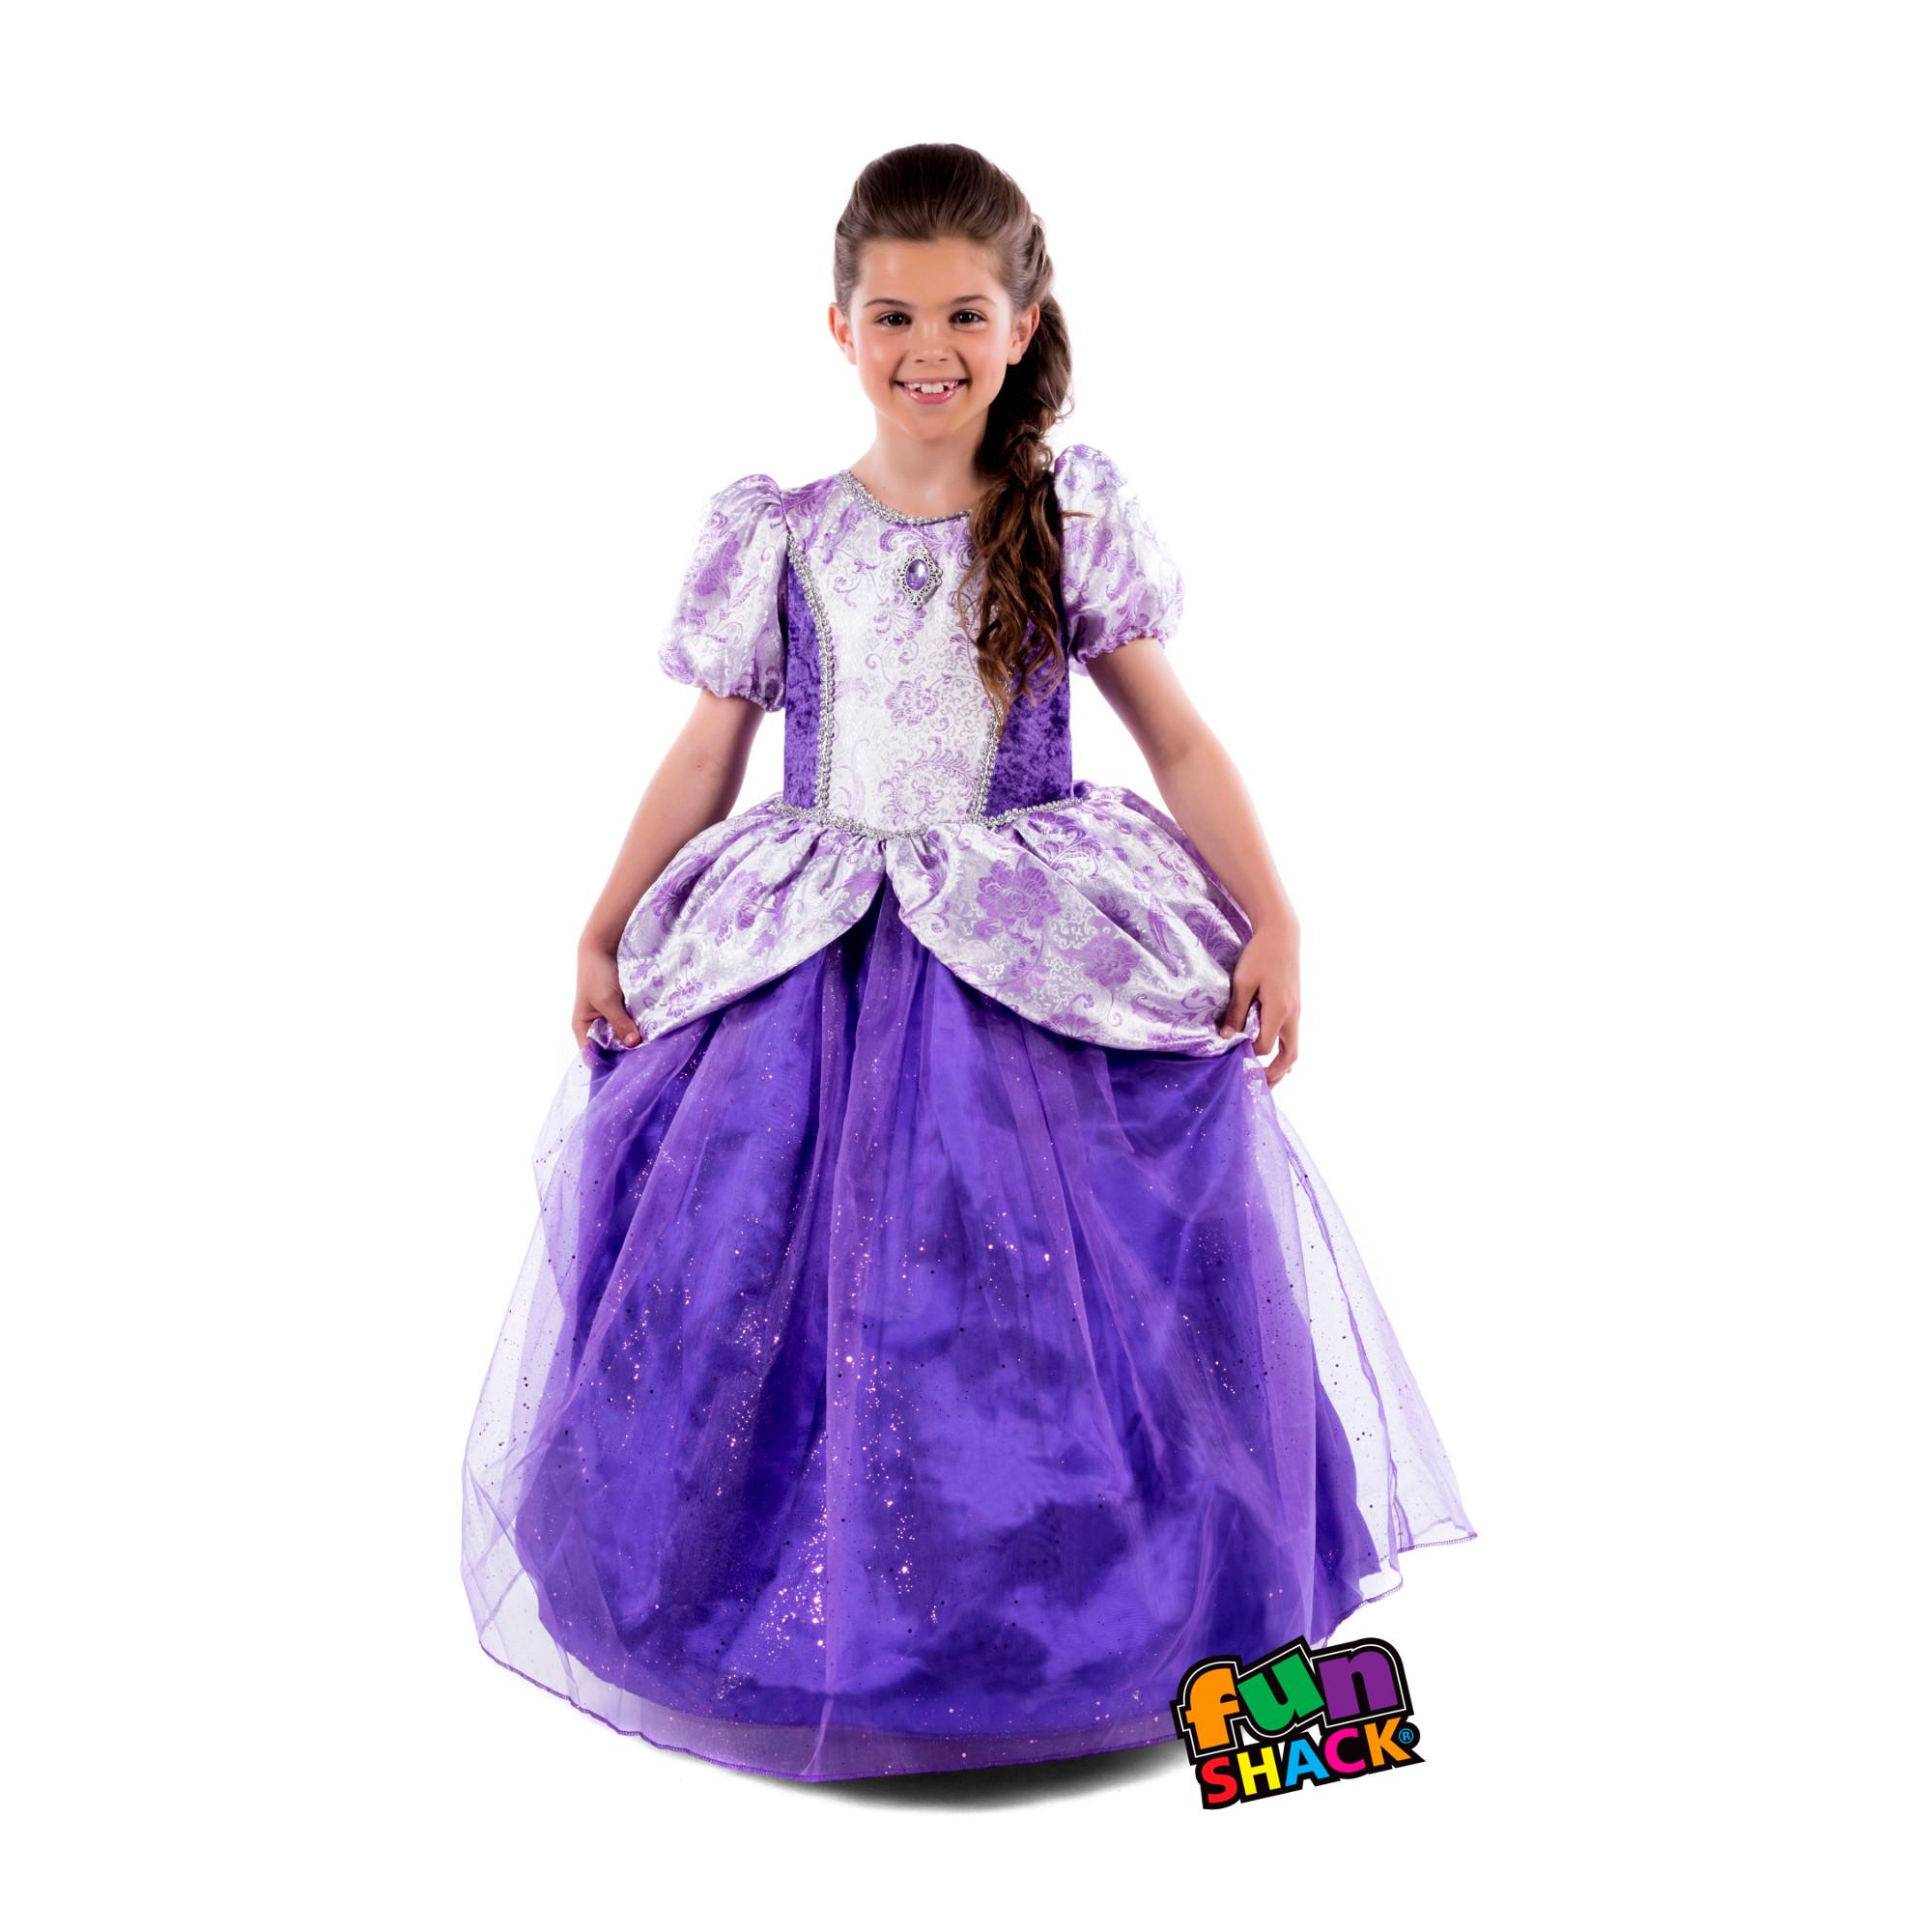 2d06c6dd9c5f Costume principessa Charlotte deluxe Bimba - Shop Magic Games Party